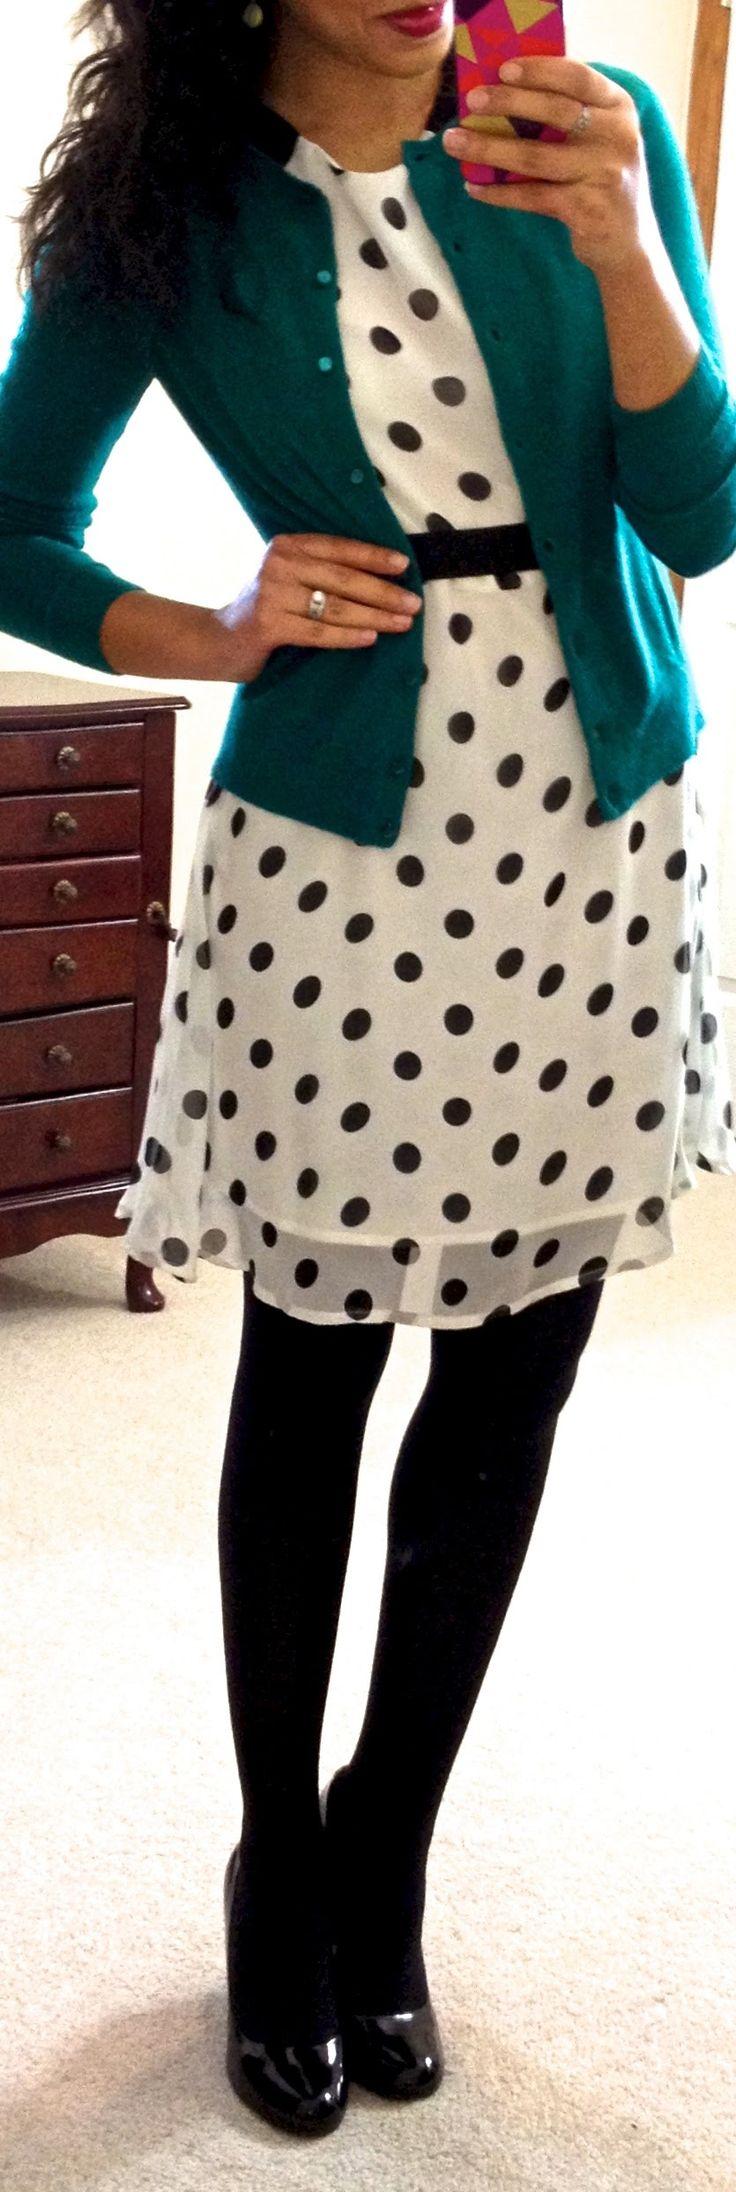 polka dot dress, cardigan, black tights, black shoes. {teacher fashion outfit Lehrerin Kleidung}